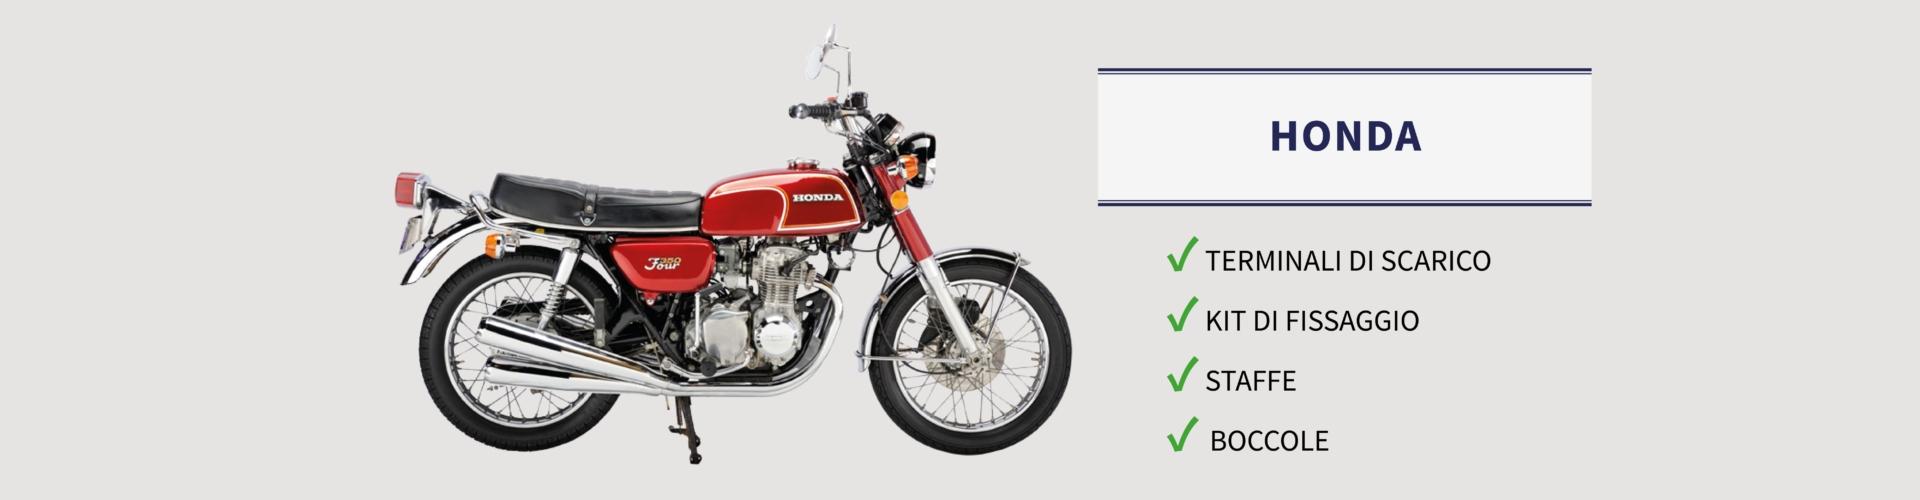 moto-storiche-italiane-terminali-moto-epoca-honda-four-350-rid